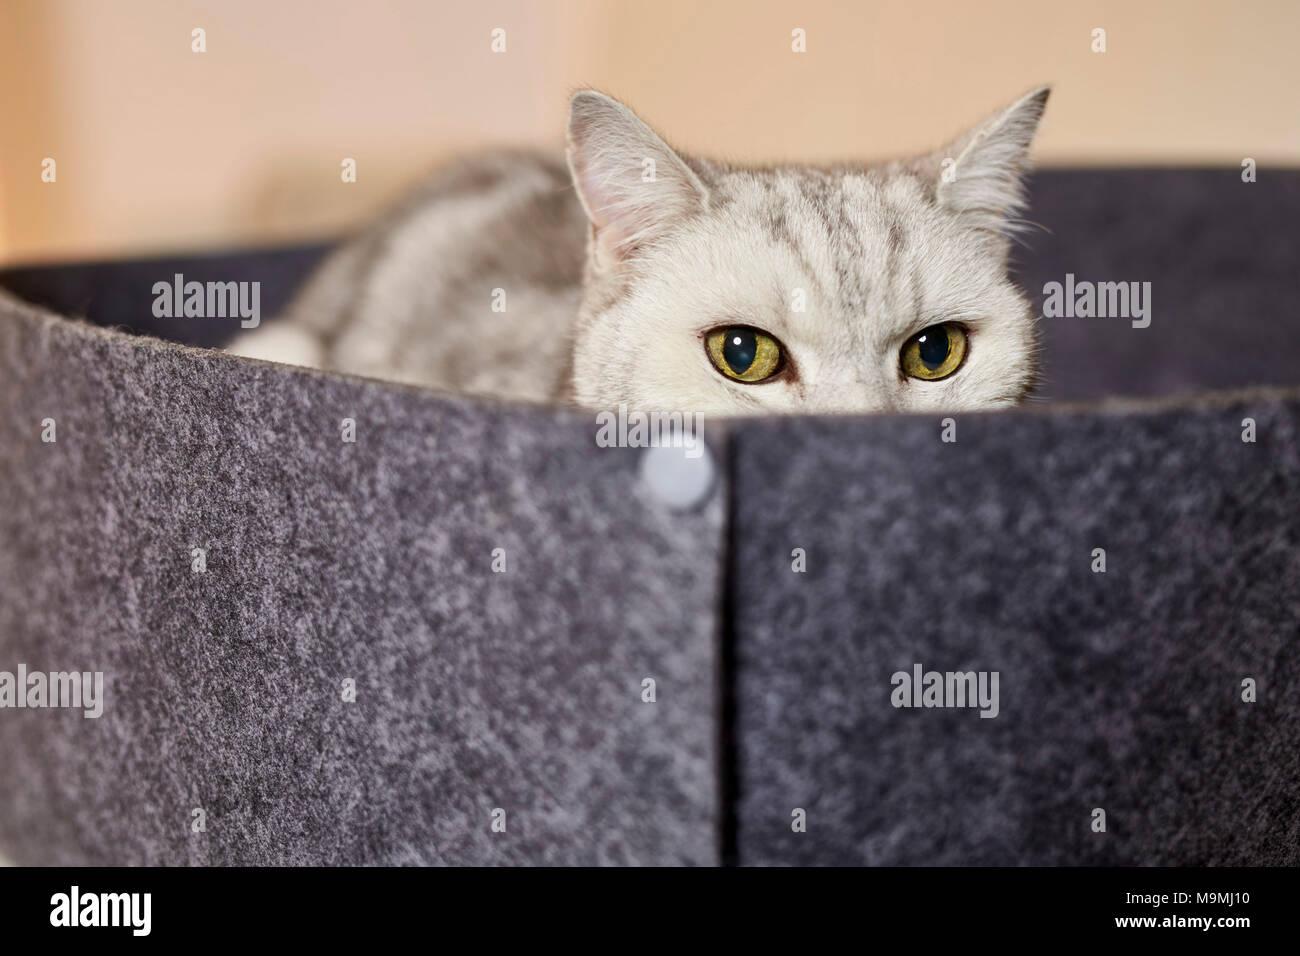 British Shorthair cat. Tabby adulto giacente lettino pet fatta di feltro. Germania Immagini Stock